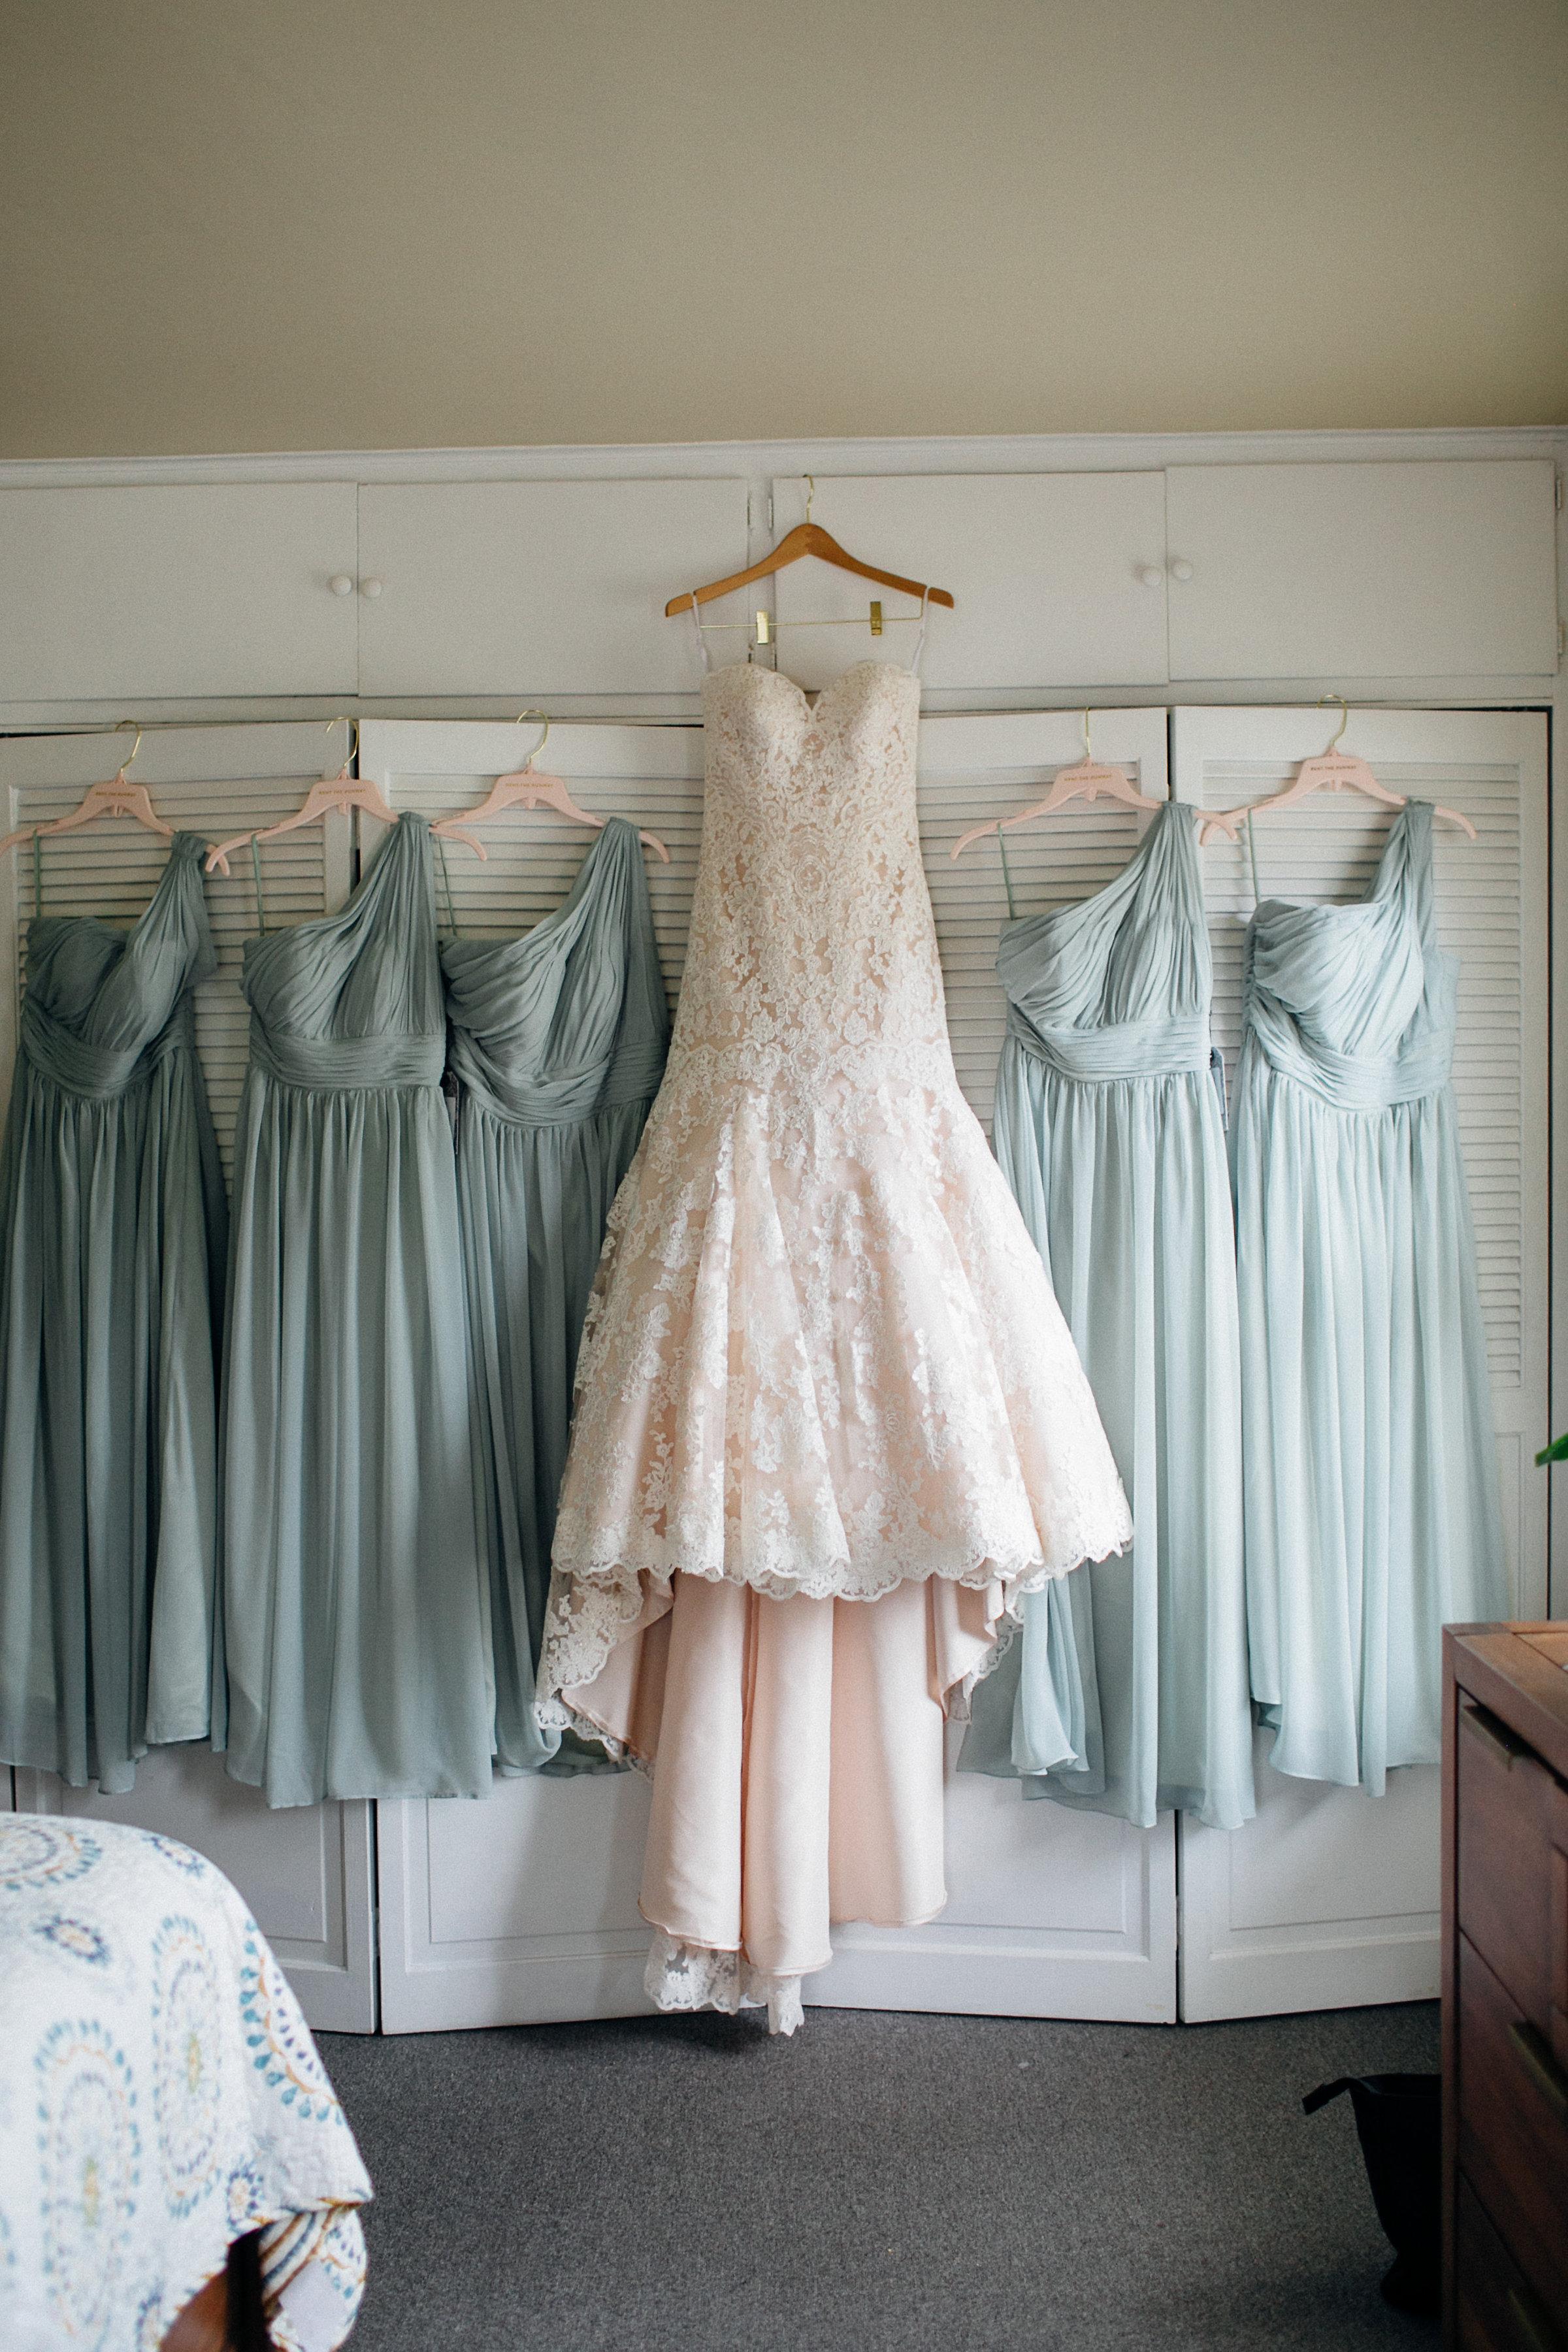 52e68-elegant-country-charm-ranch-wedding-bride-and-bridesmaids-dresseselegant-country-charm-ranch-wedding-bride-and-bridesmaids-dresses.jpg